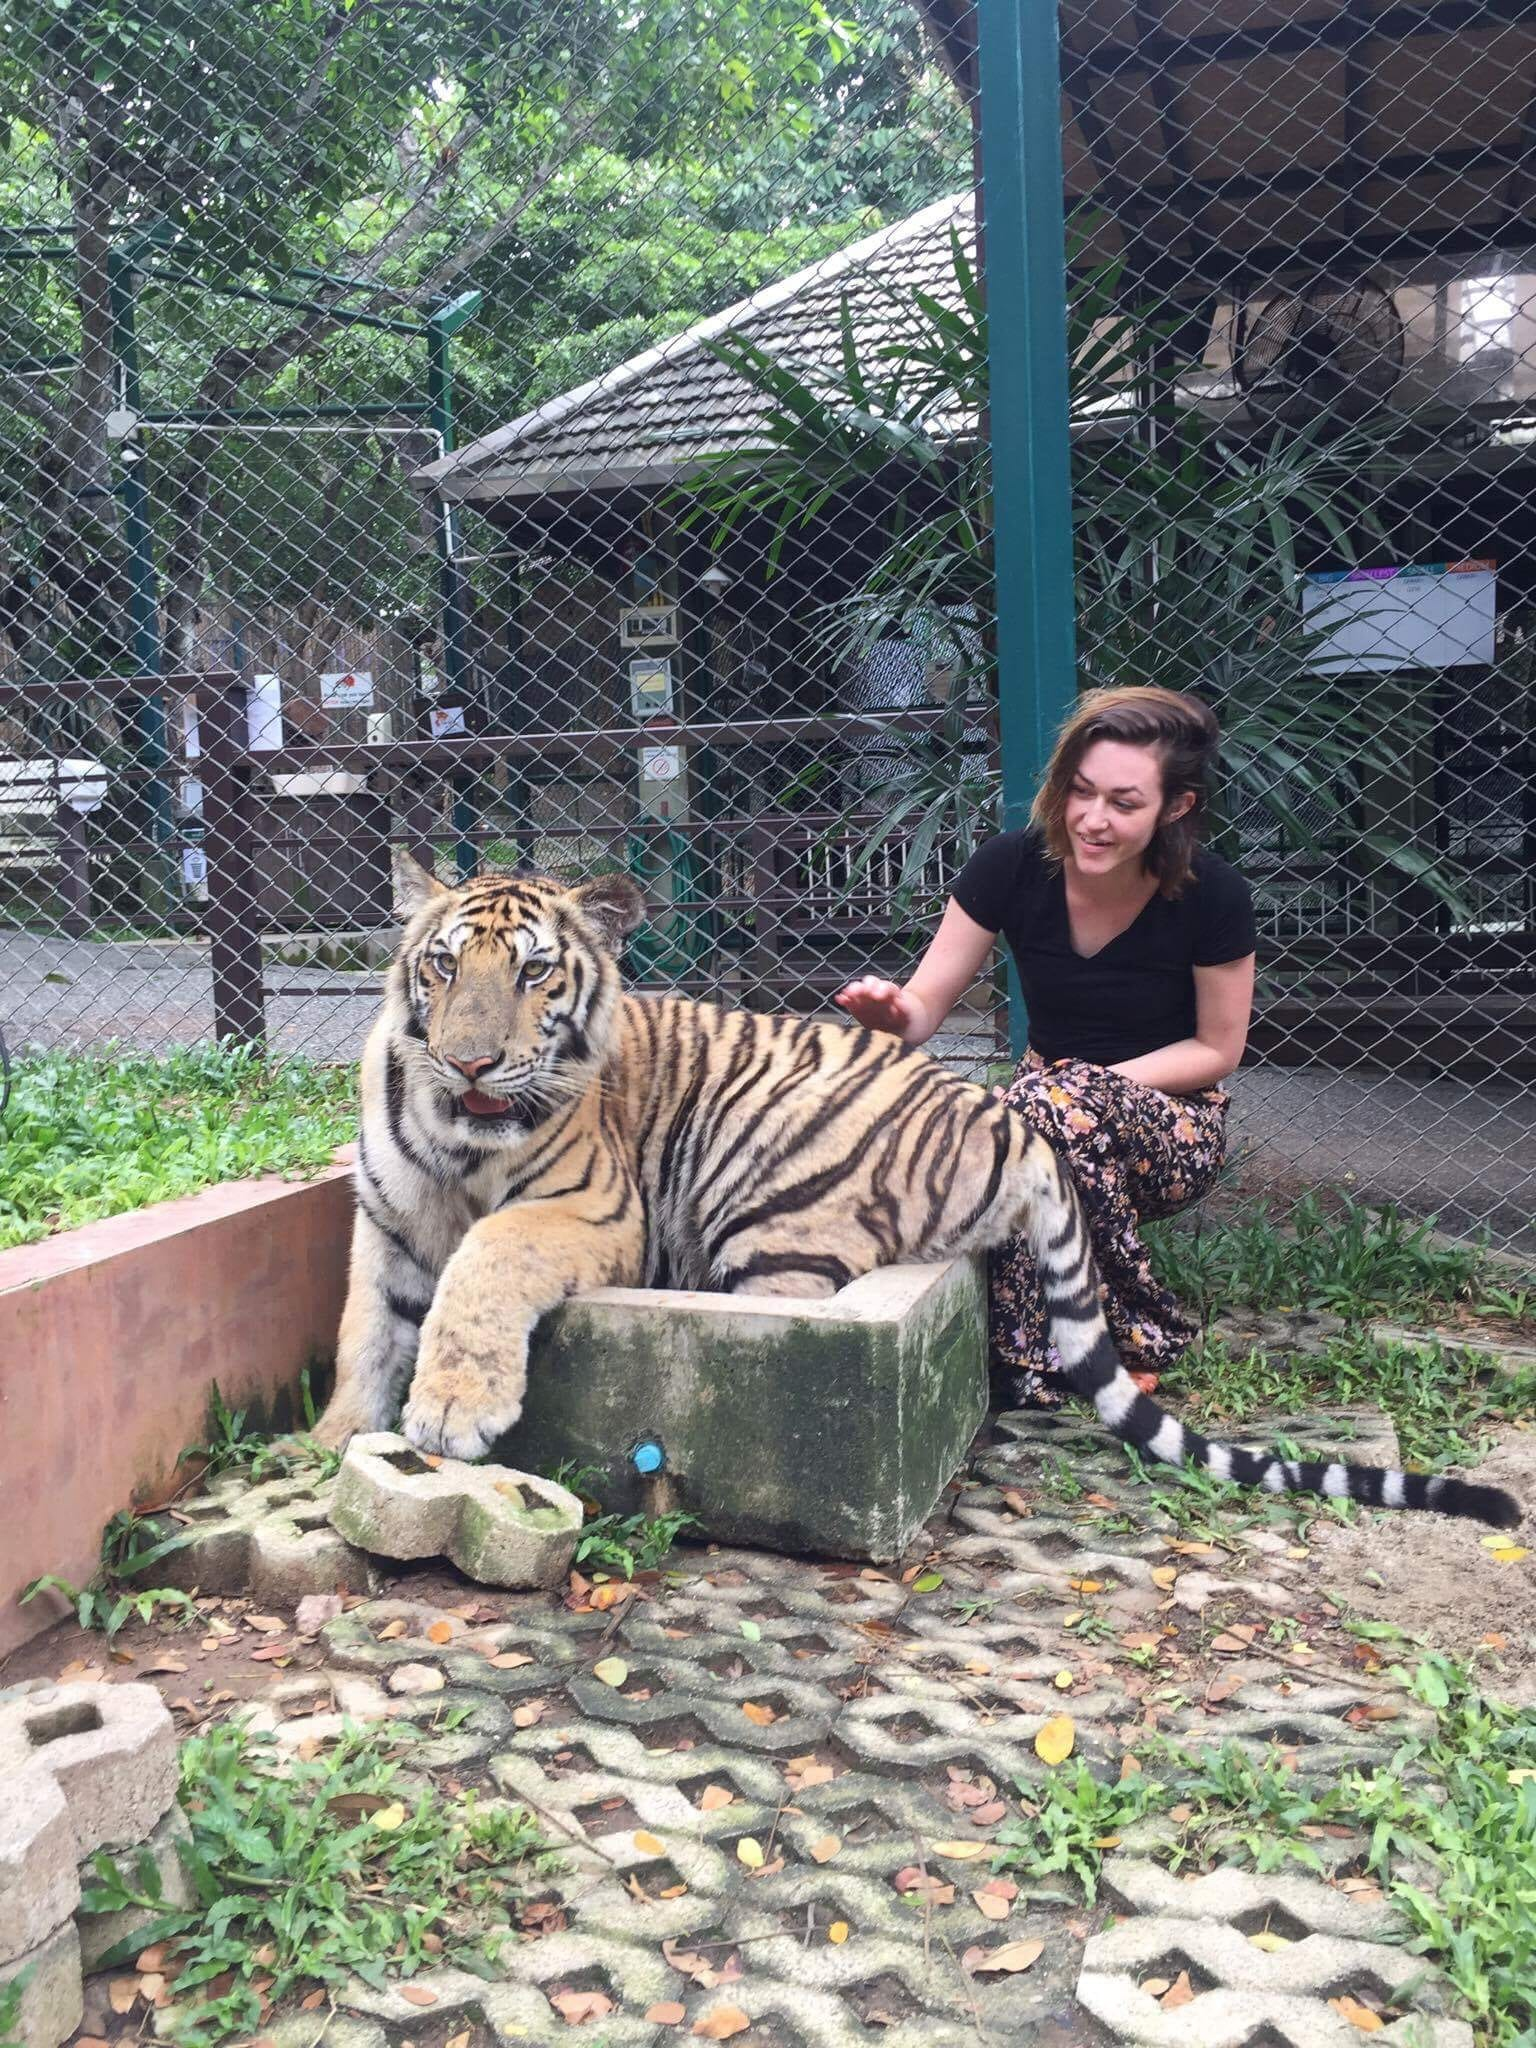 Petting a tiger (!!!)